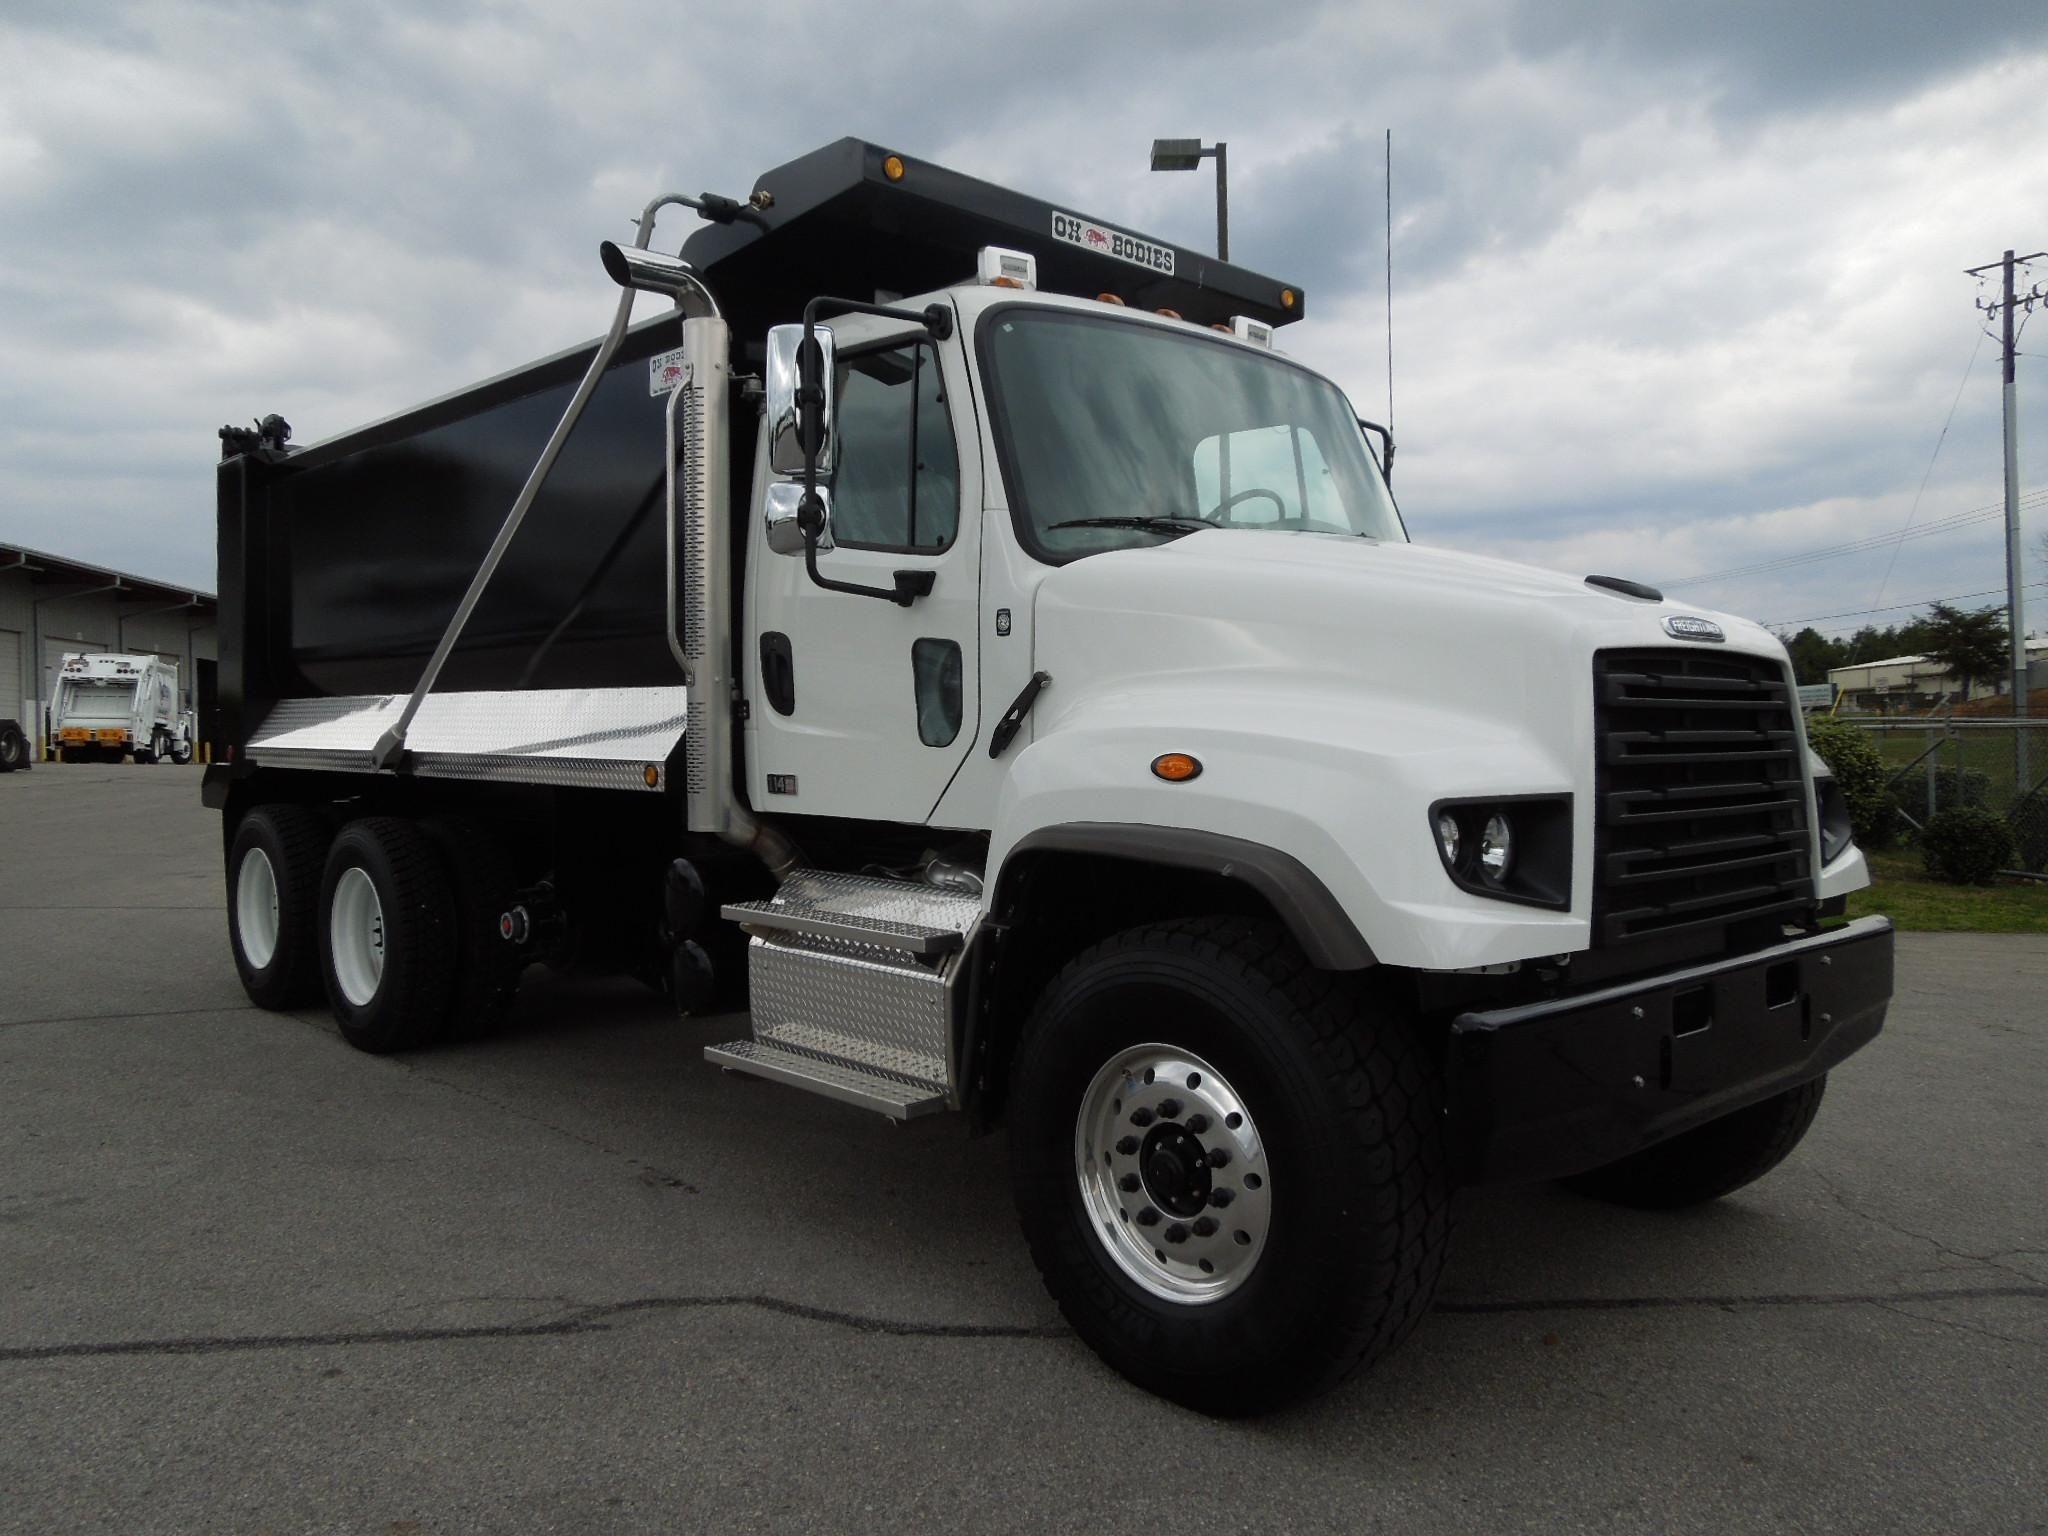 Trucking Trucks, Dump trucks, Heavy construction equipment